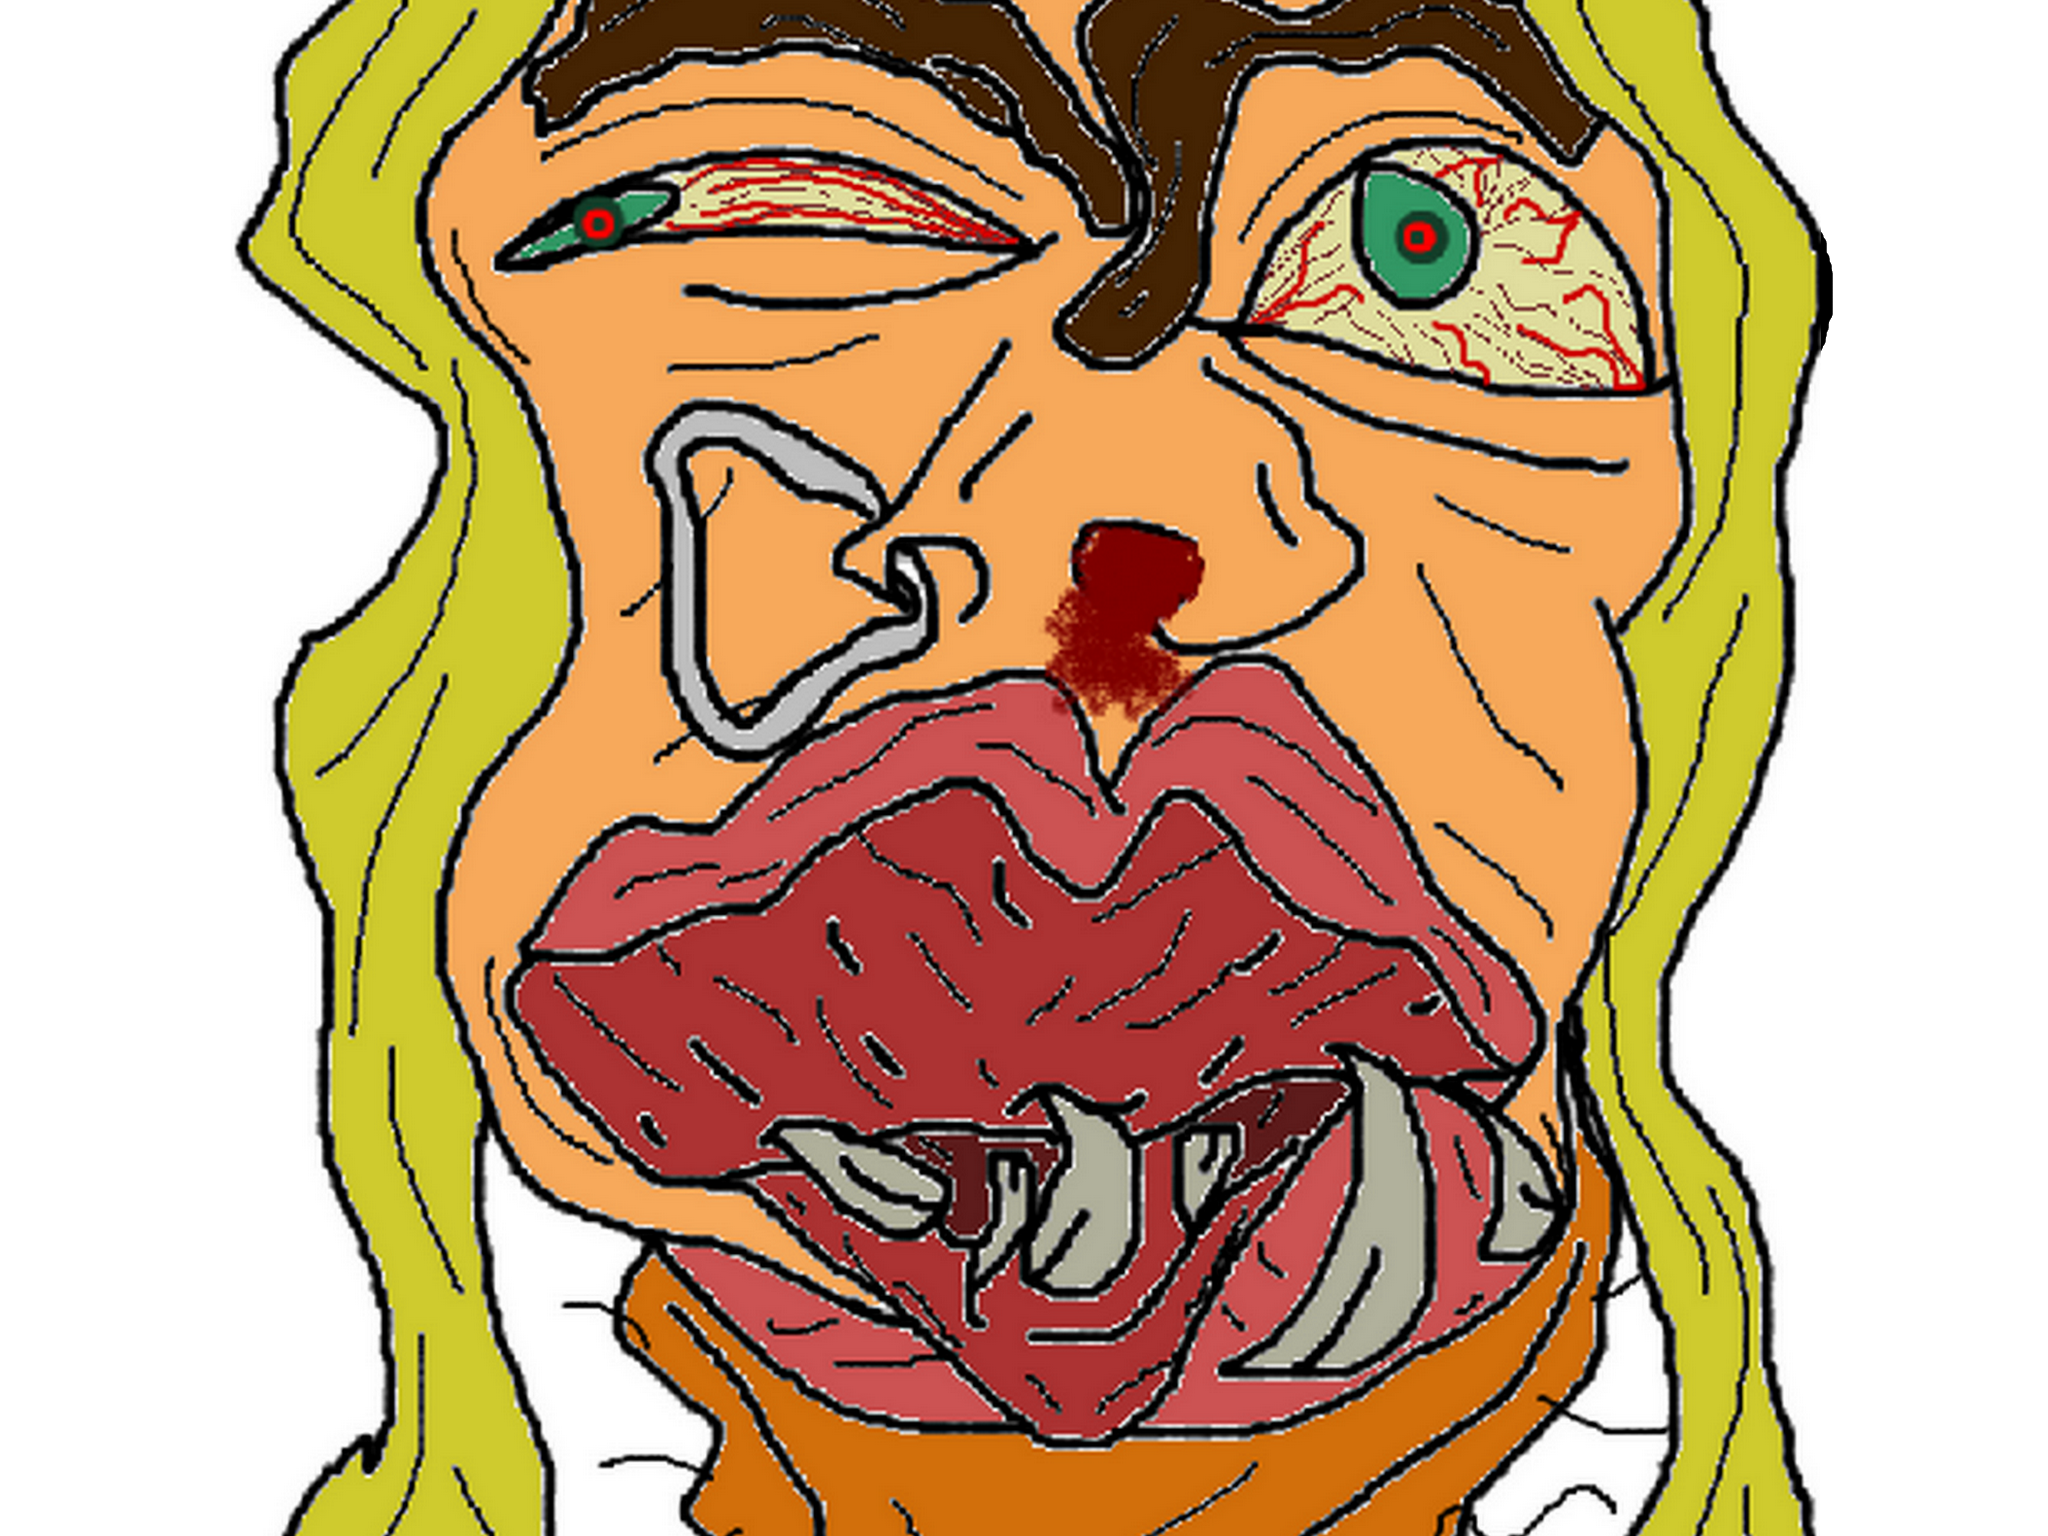 Sticker other feministe ugly moche creepy monstre omg